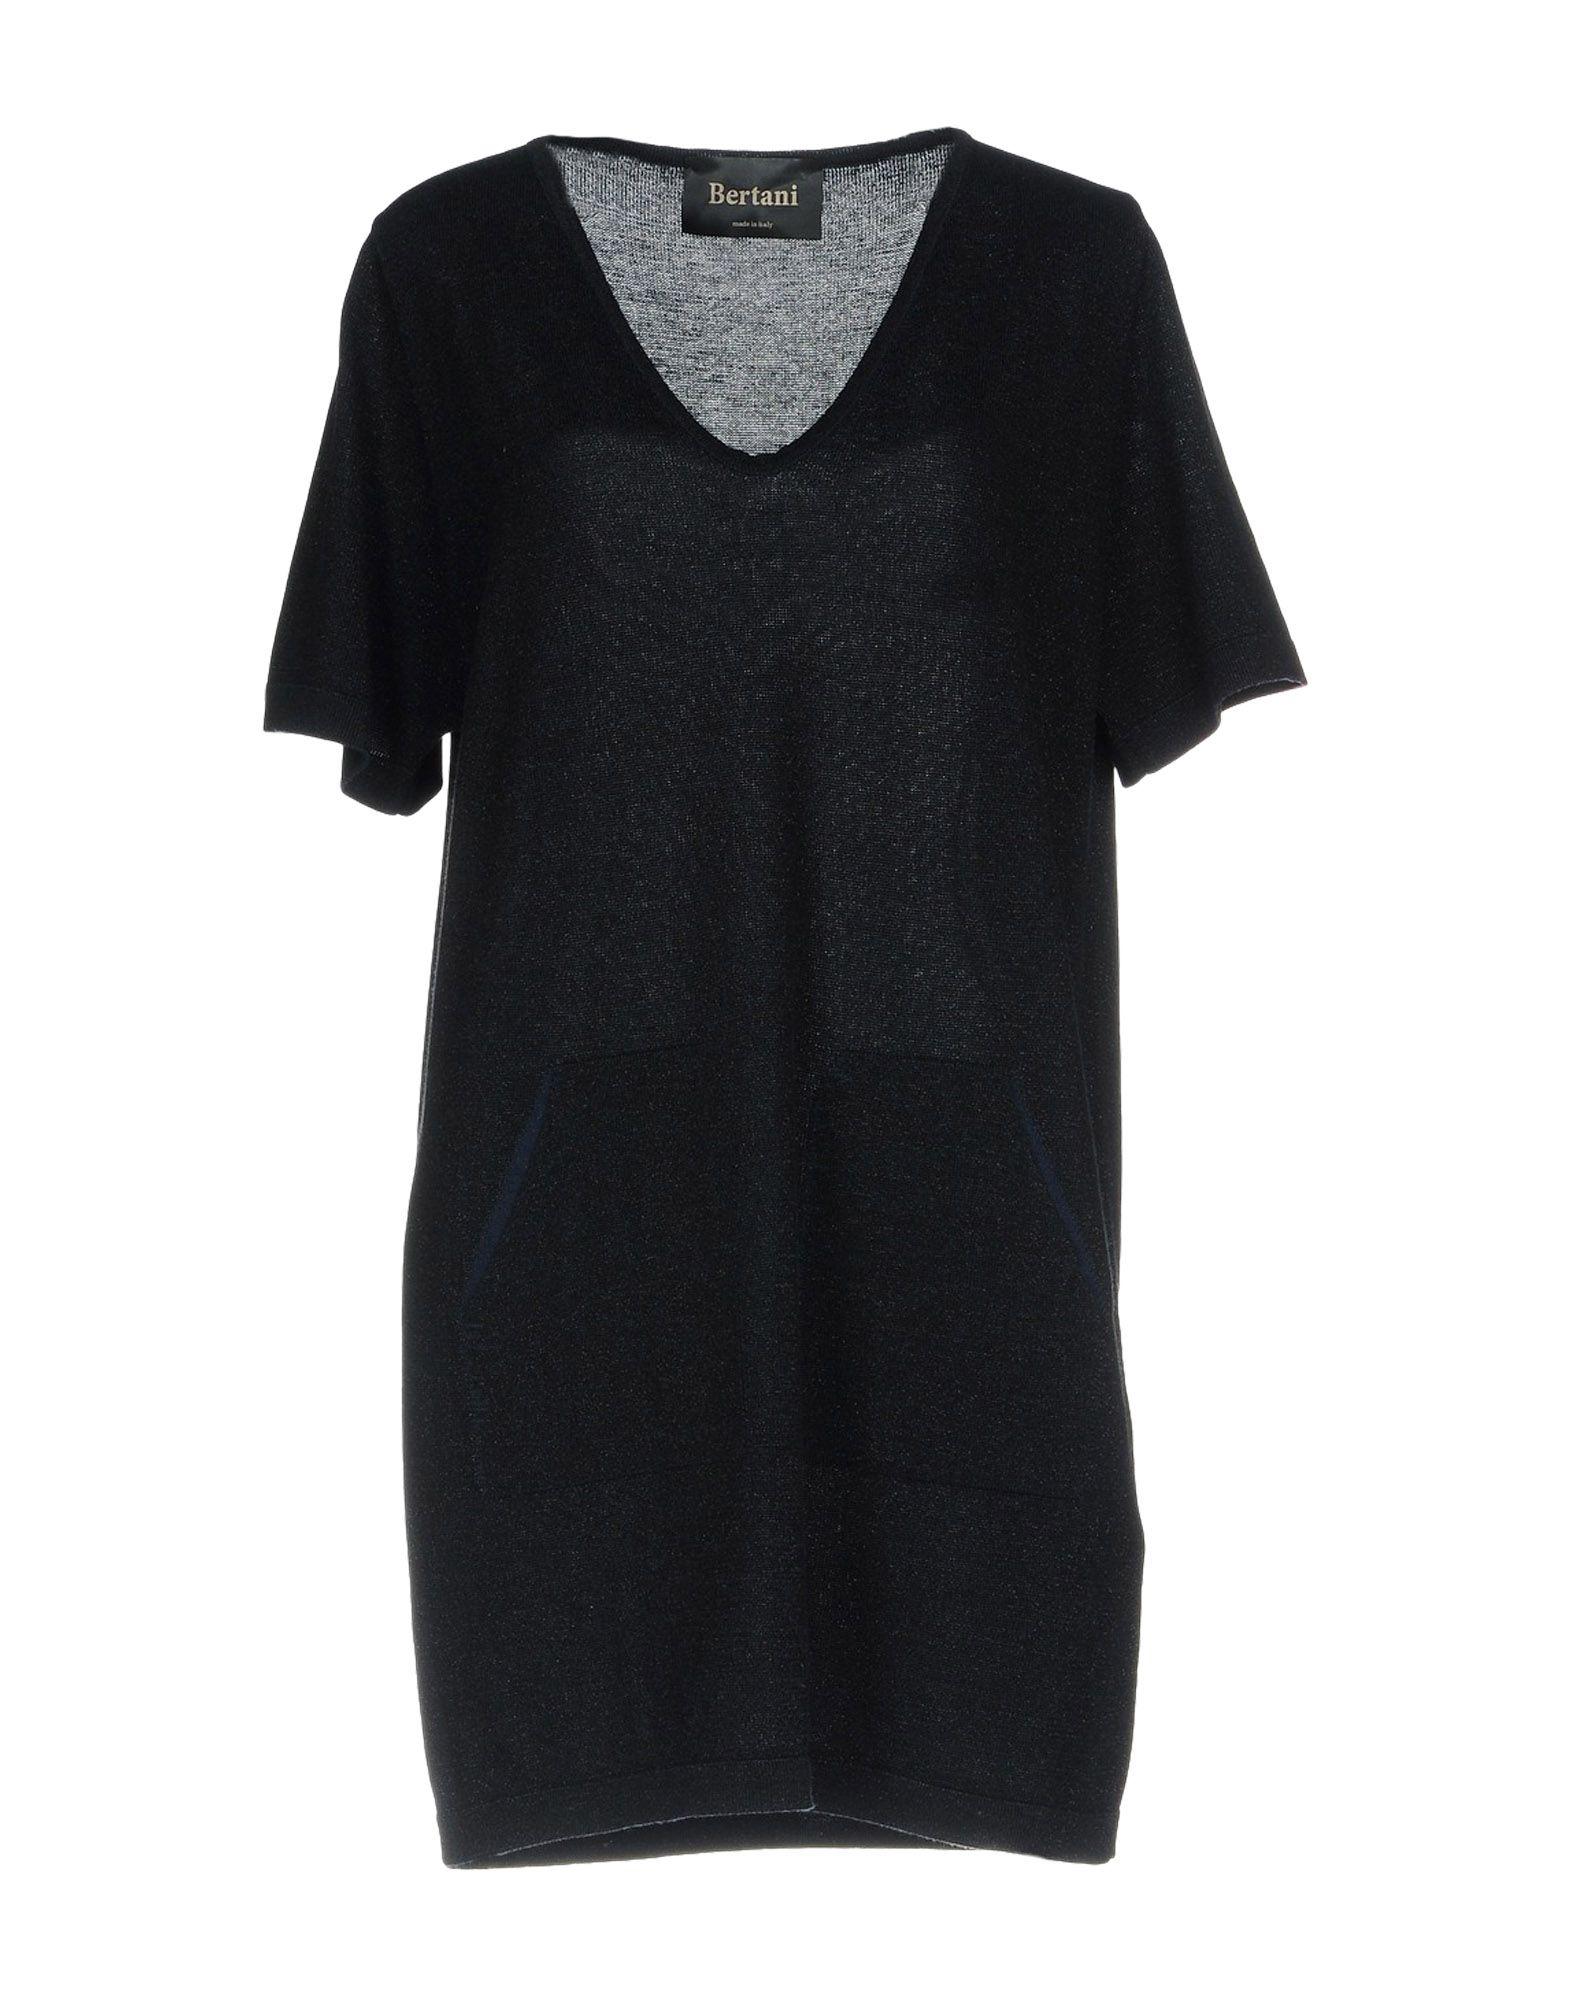 CHIARA BERTANI Короткое платье